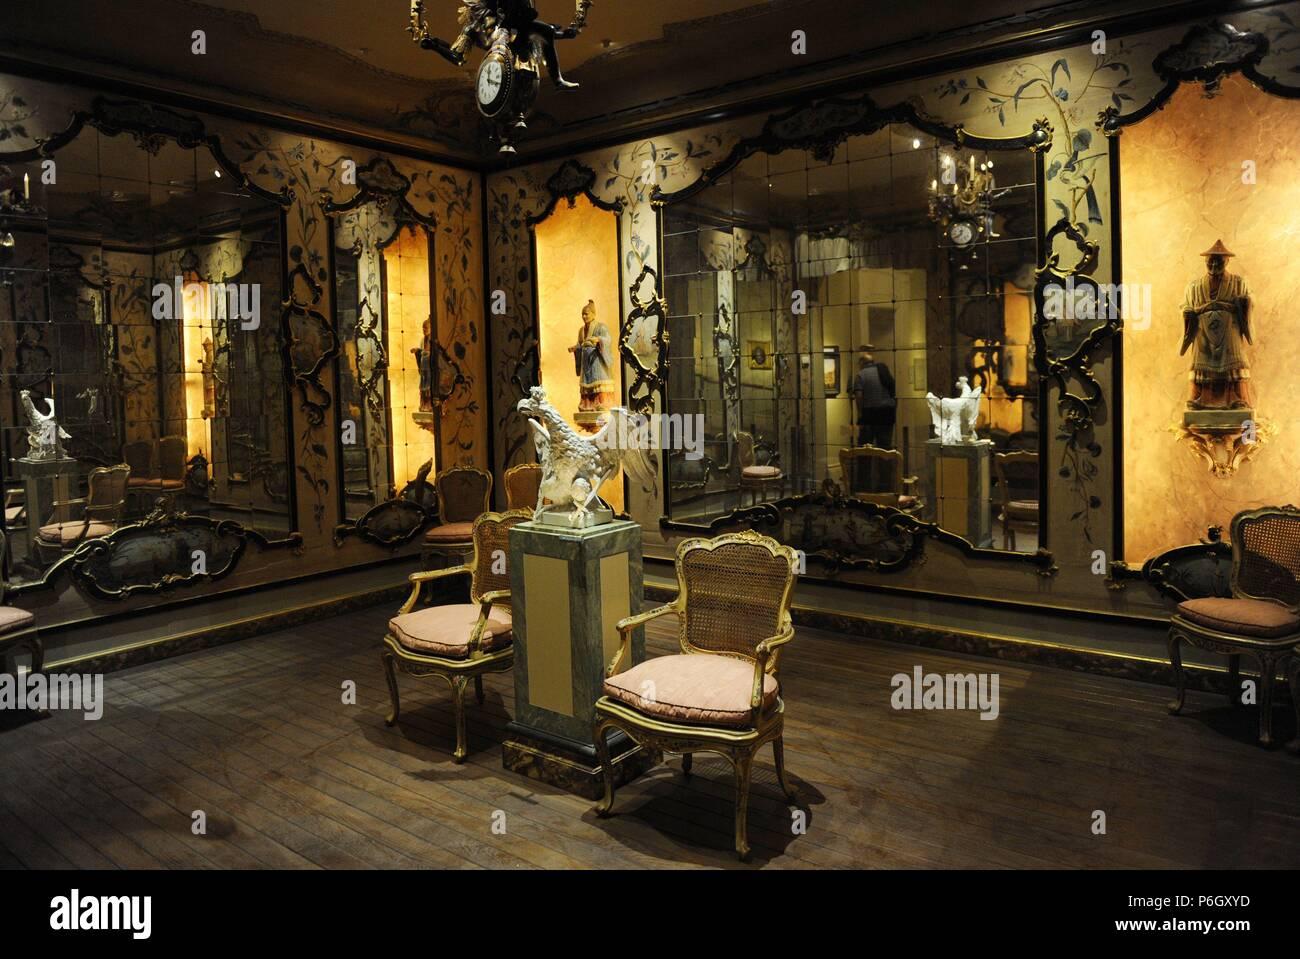 Interior. Eighteenth Century Venetian Room. Decoration And Furniture.  Jerusalem.